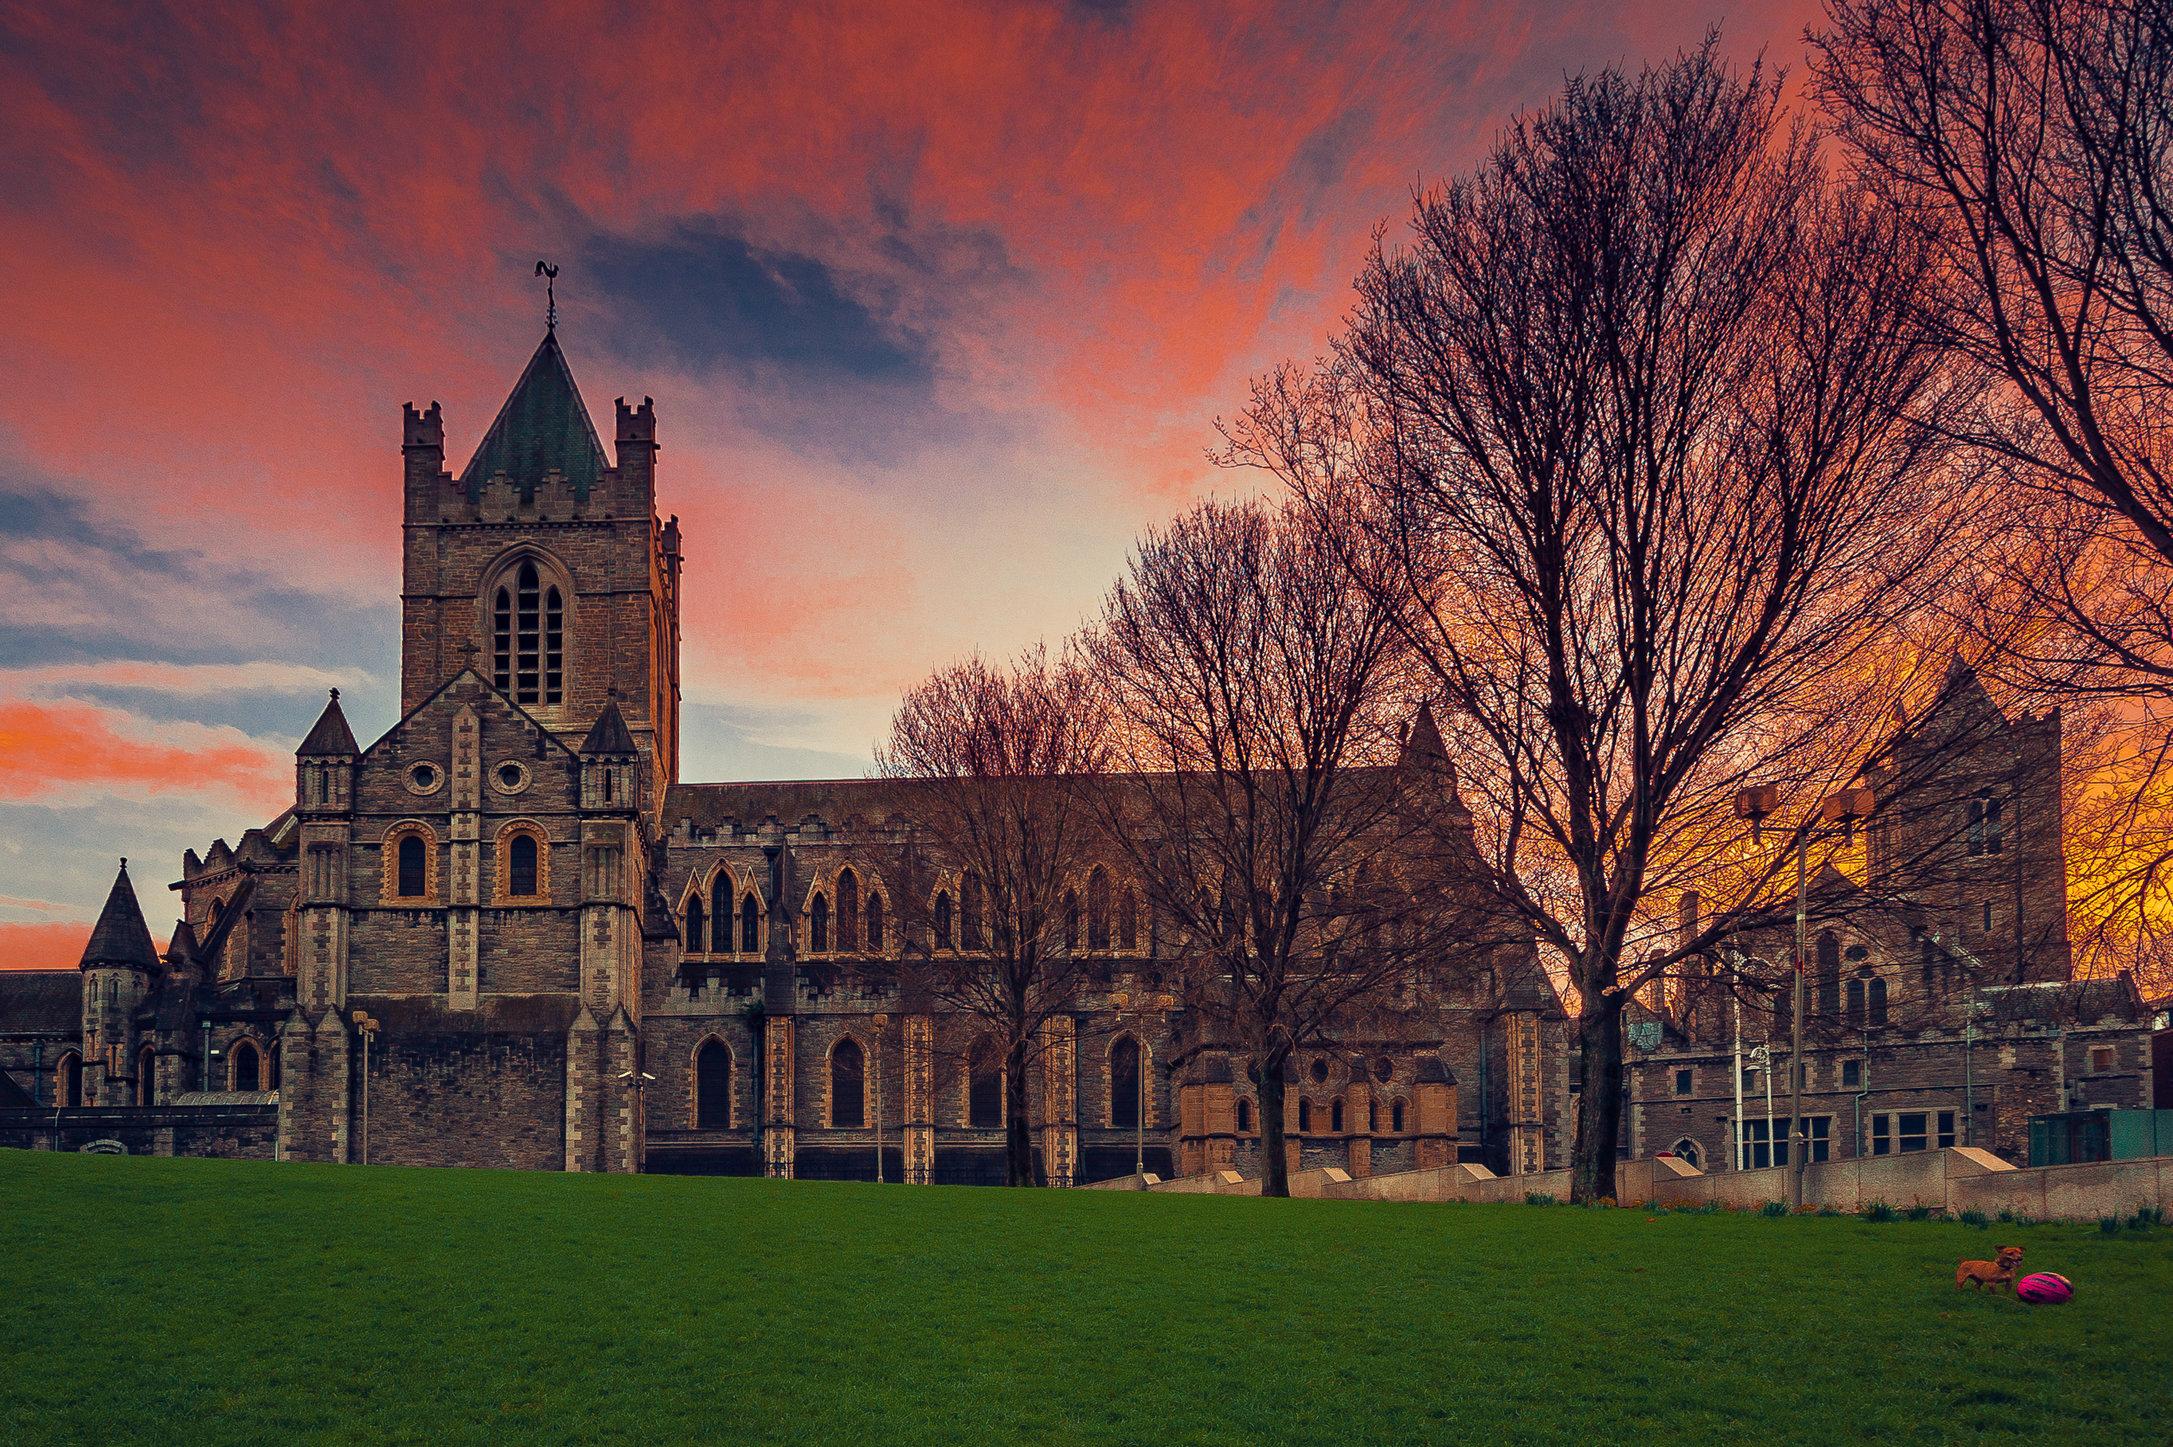 Christchurch-MASTER COPY.jpg